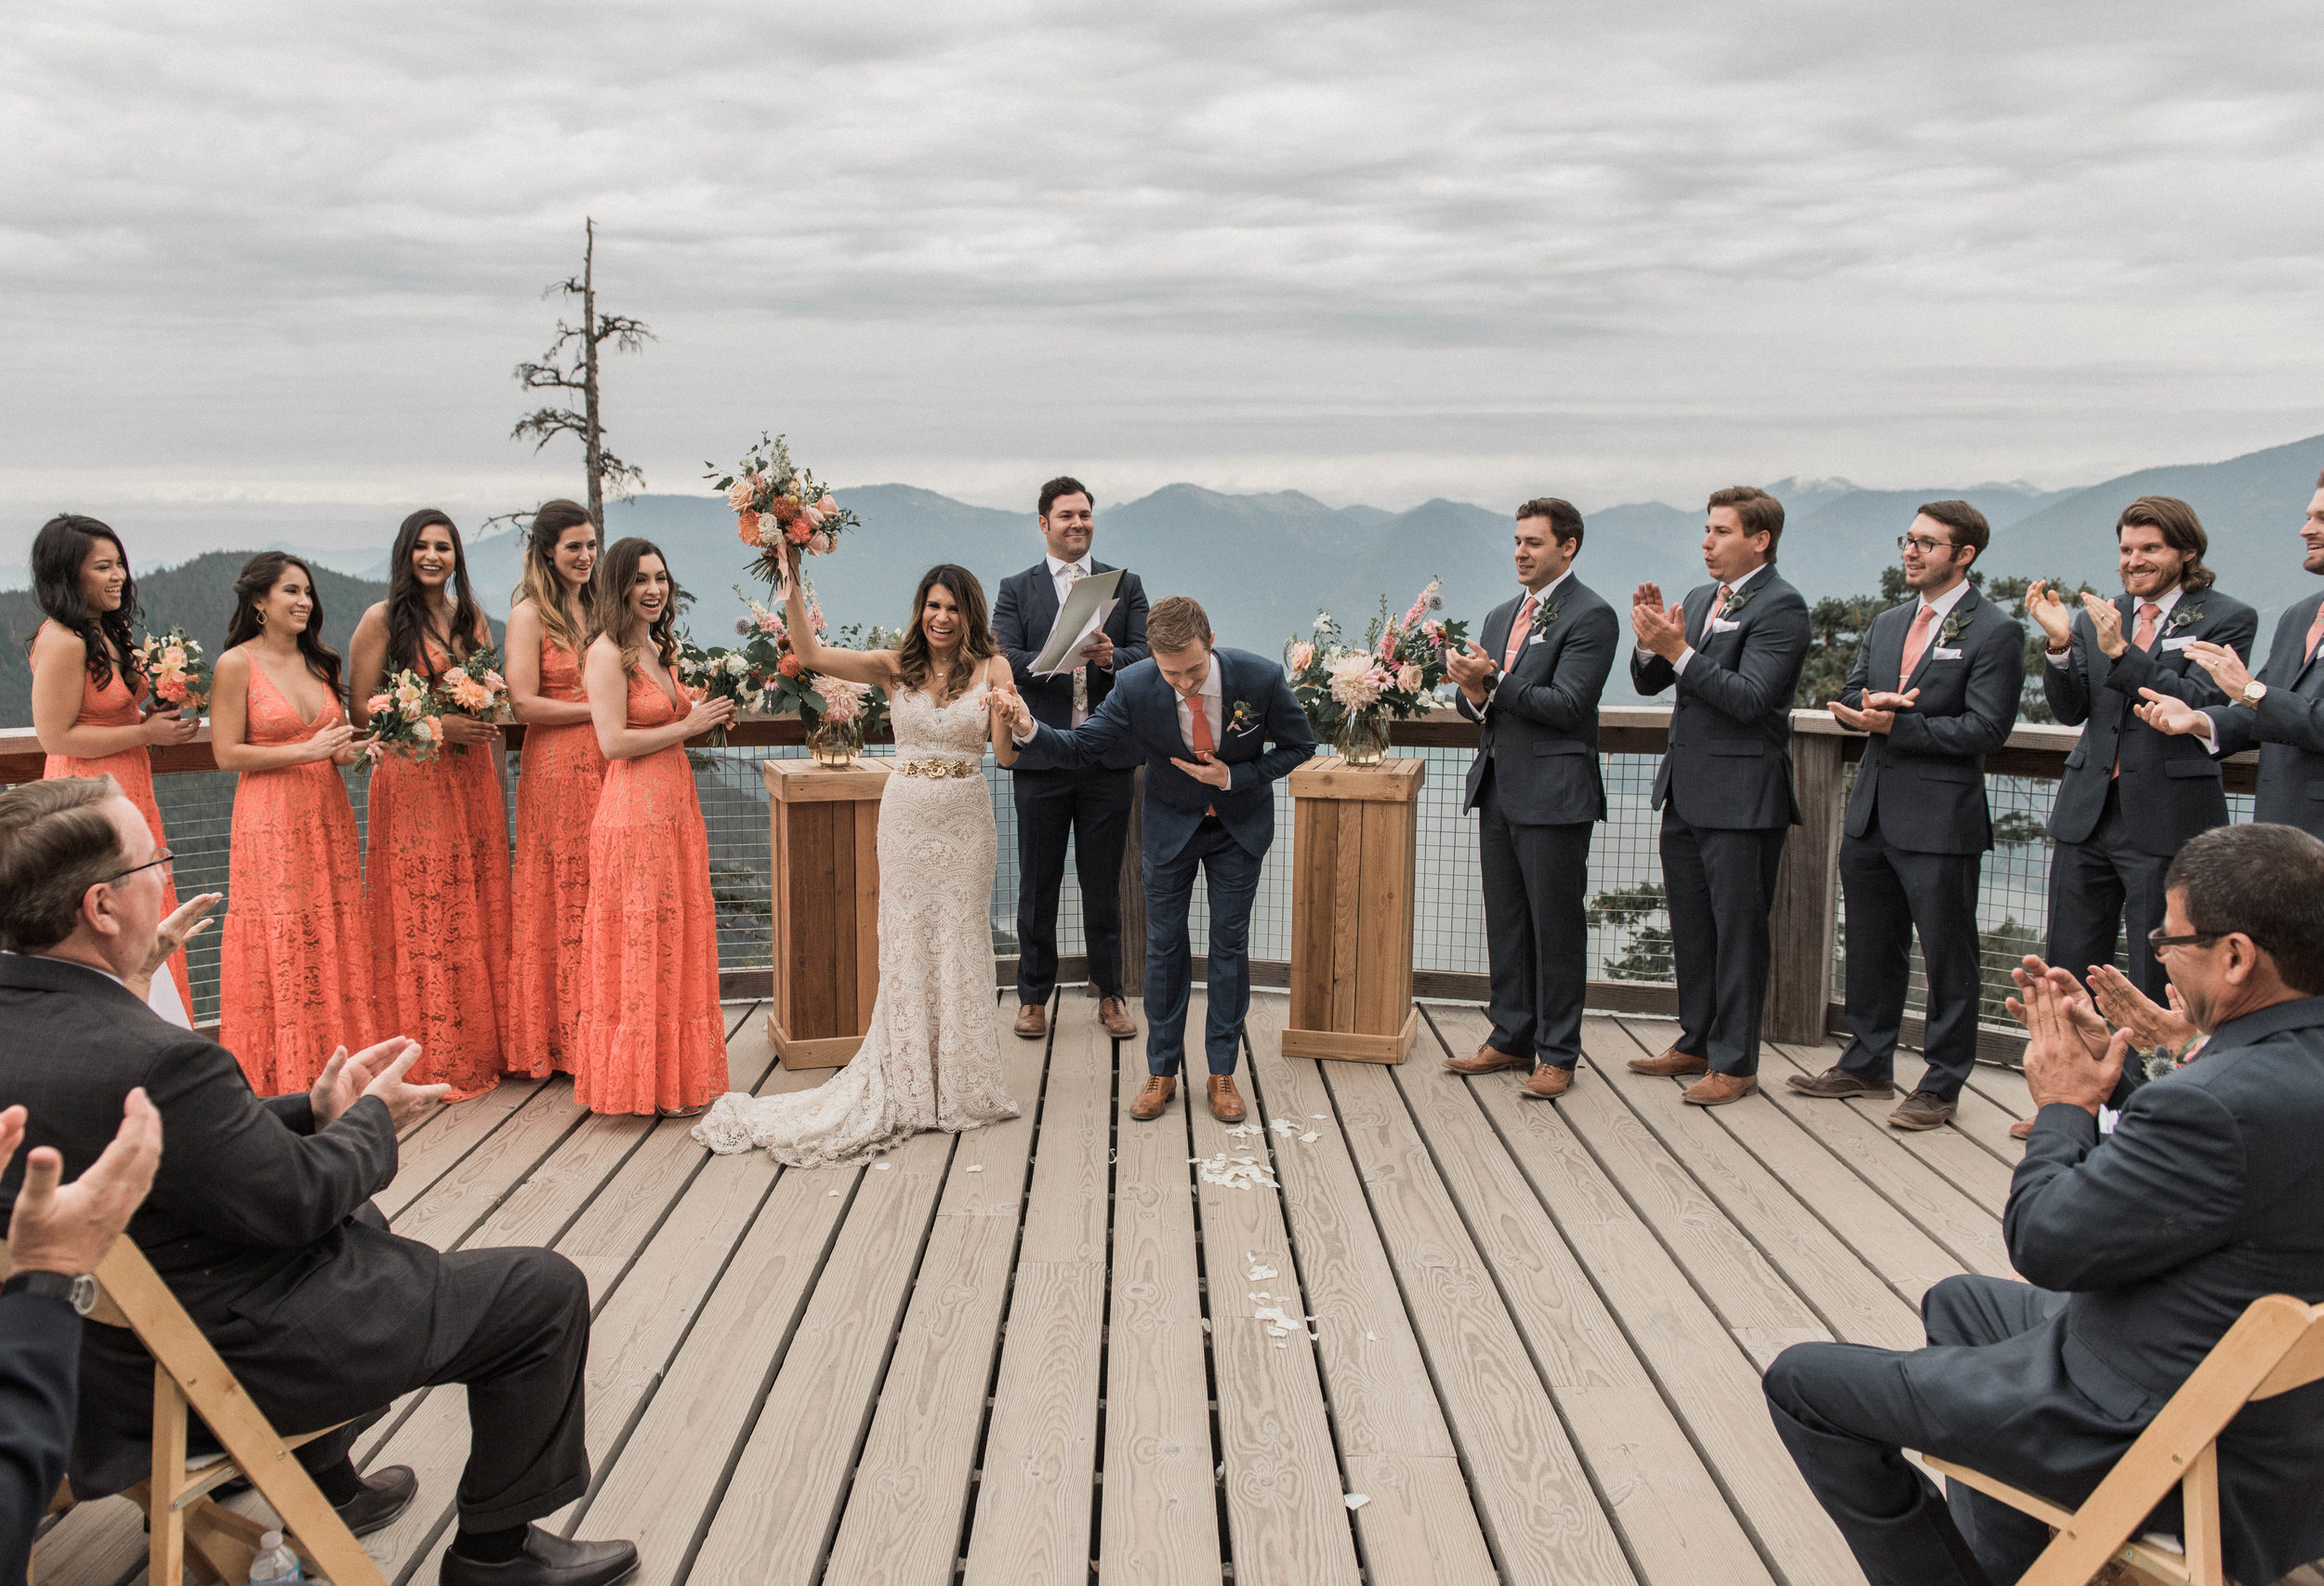 austin-texas-wedding-photography-1778-photographie-95.jpg